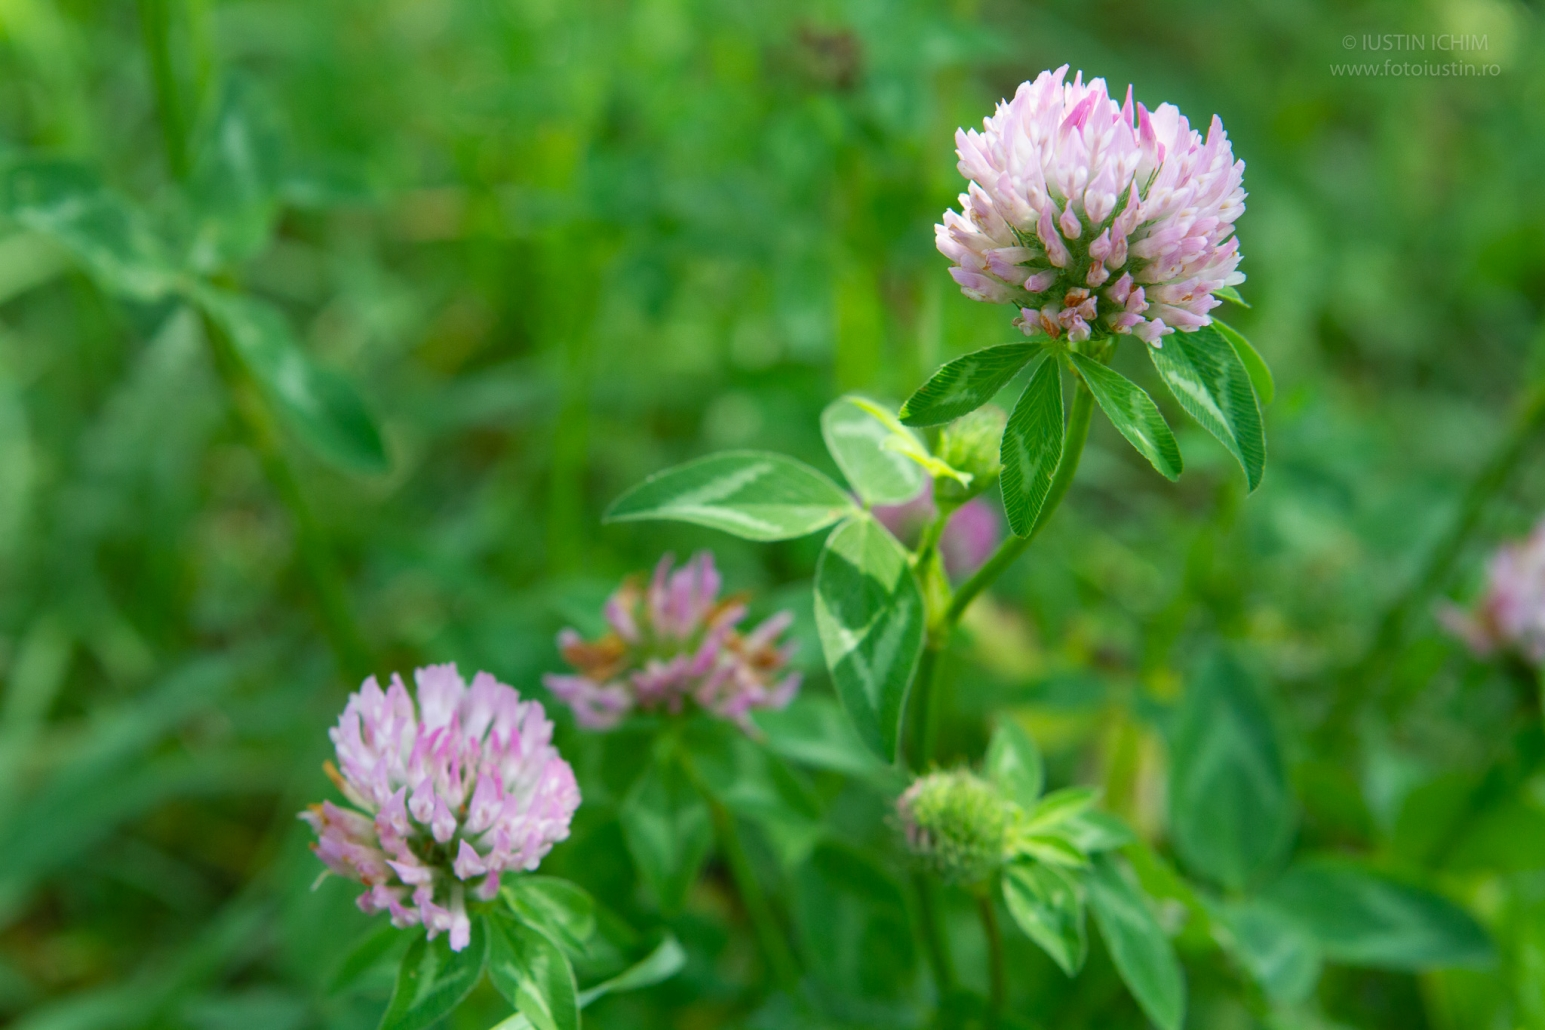 Trifolium pratense, Trifoi roşu, fam. leguminoaselor, Fabaceae